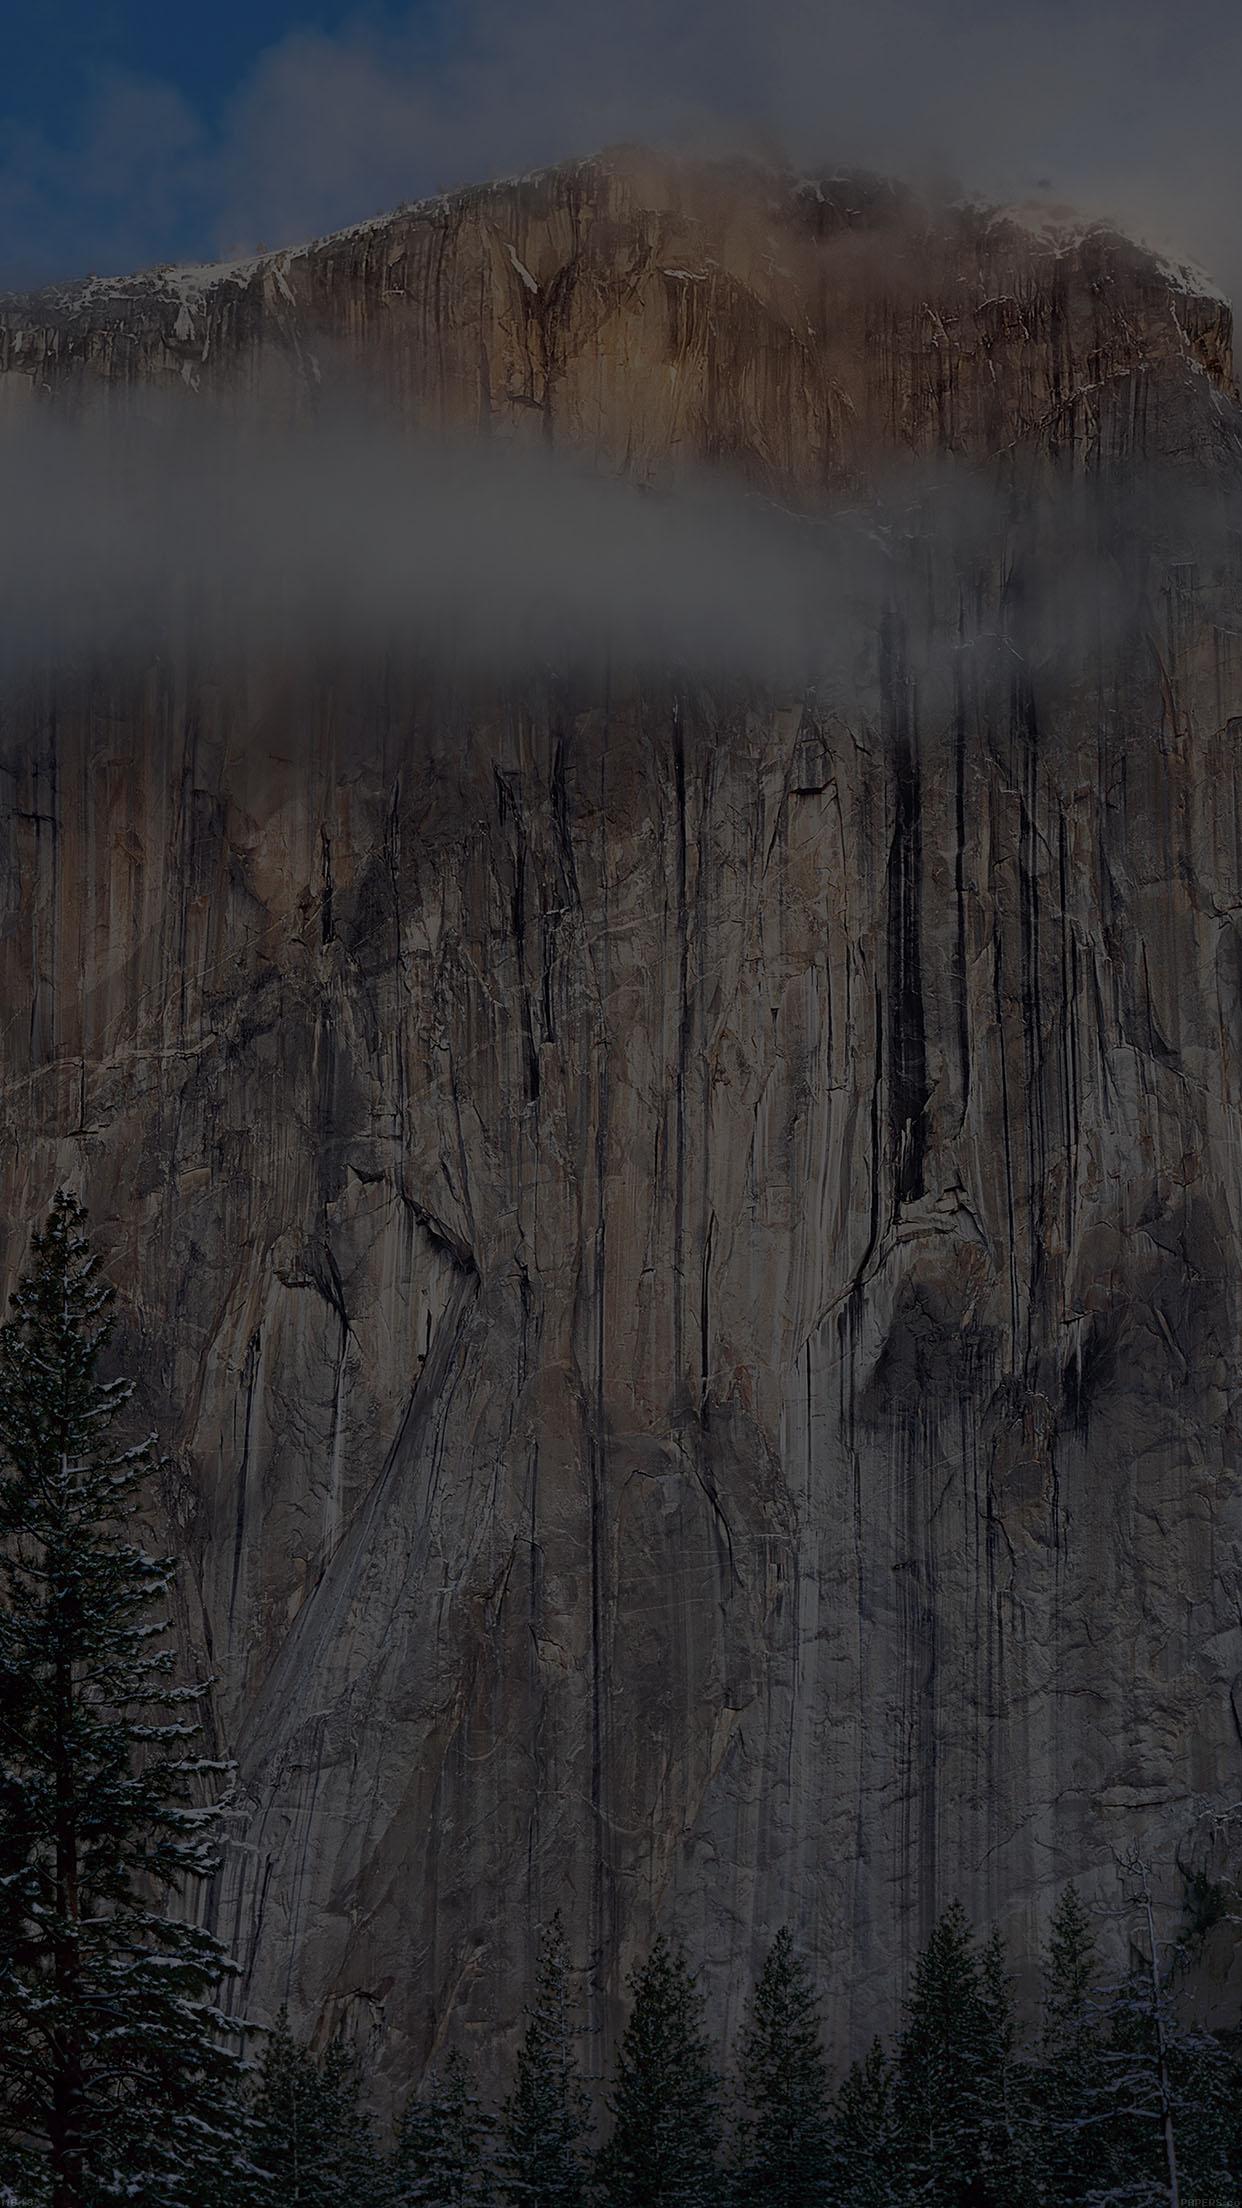 Iphone7papers Mg48 Os X Yosemite Dark Wallpaper Apple